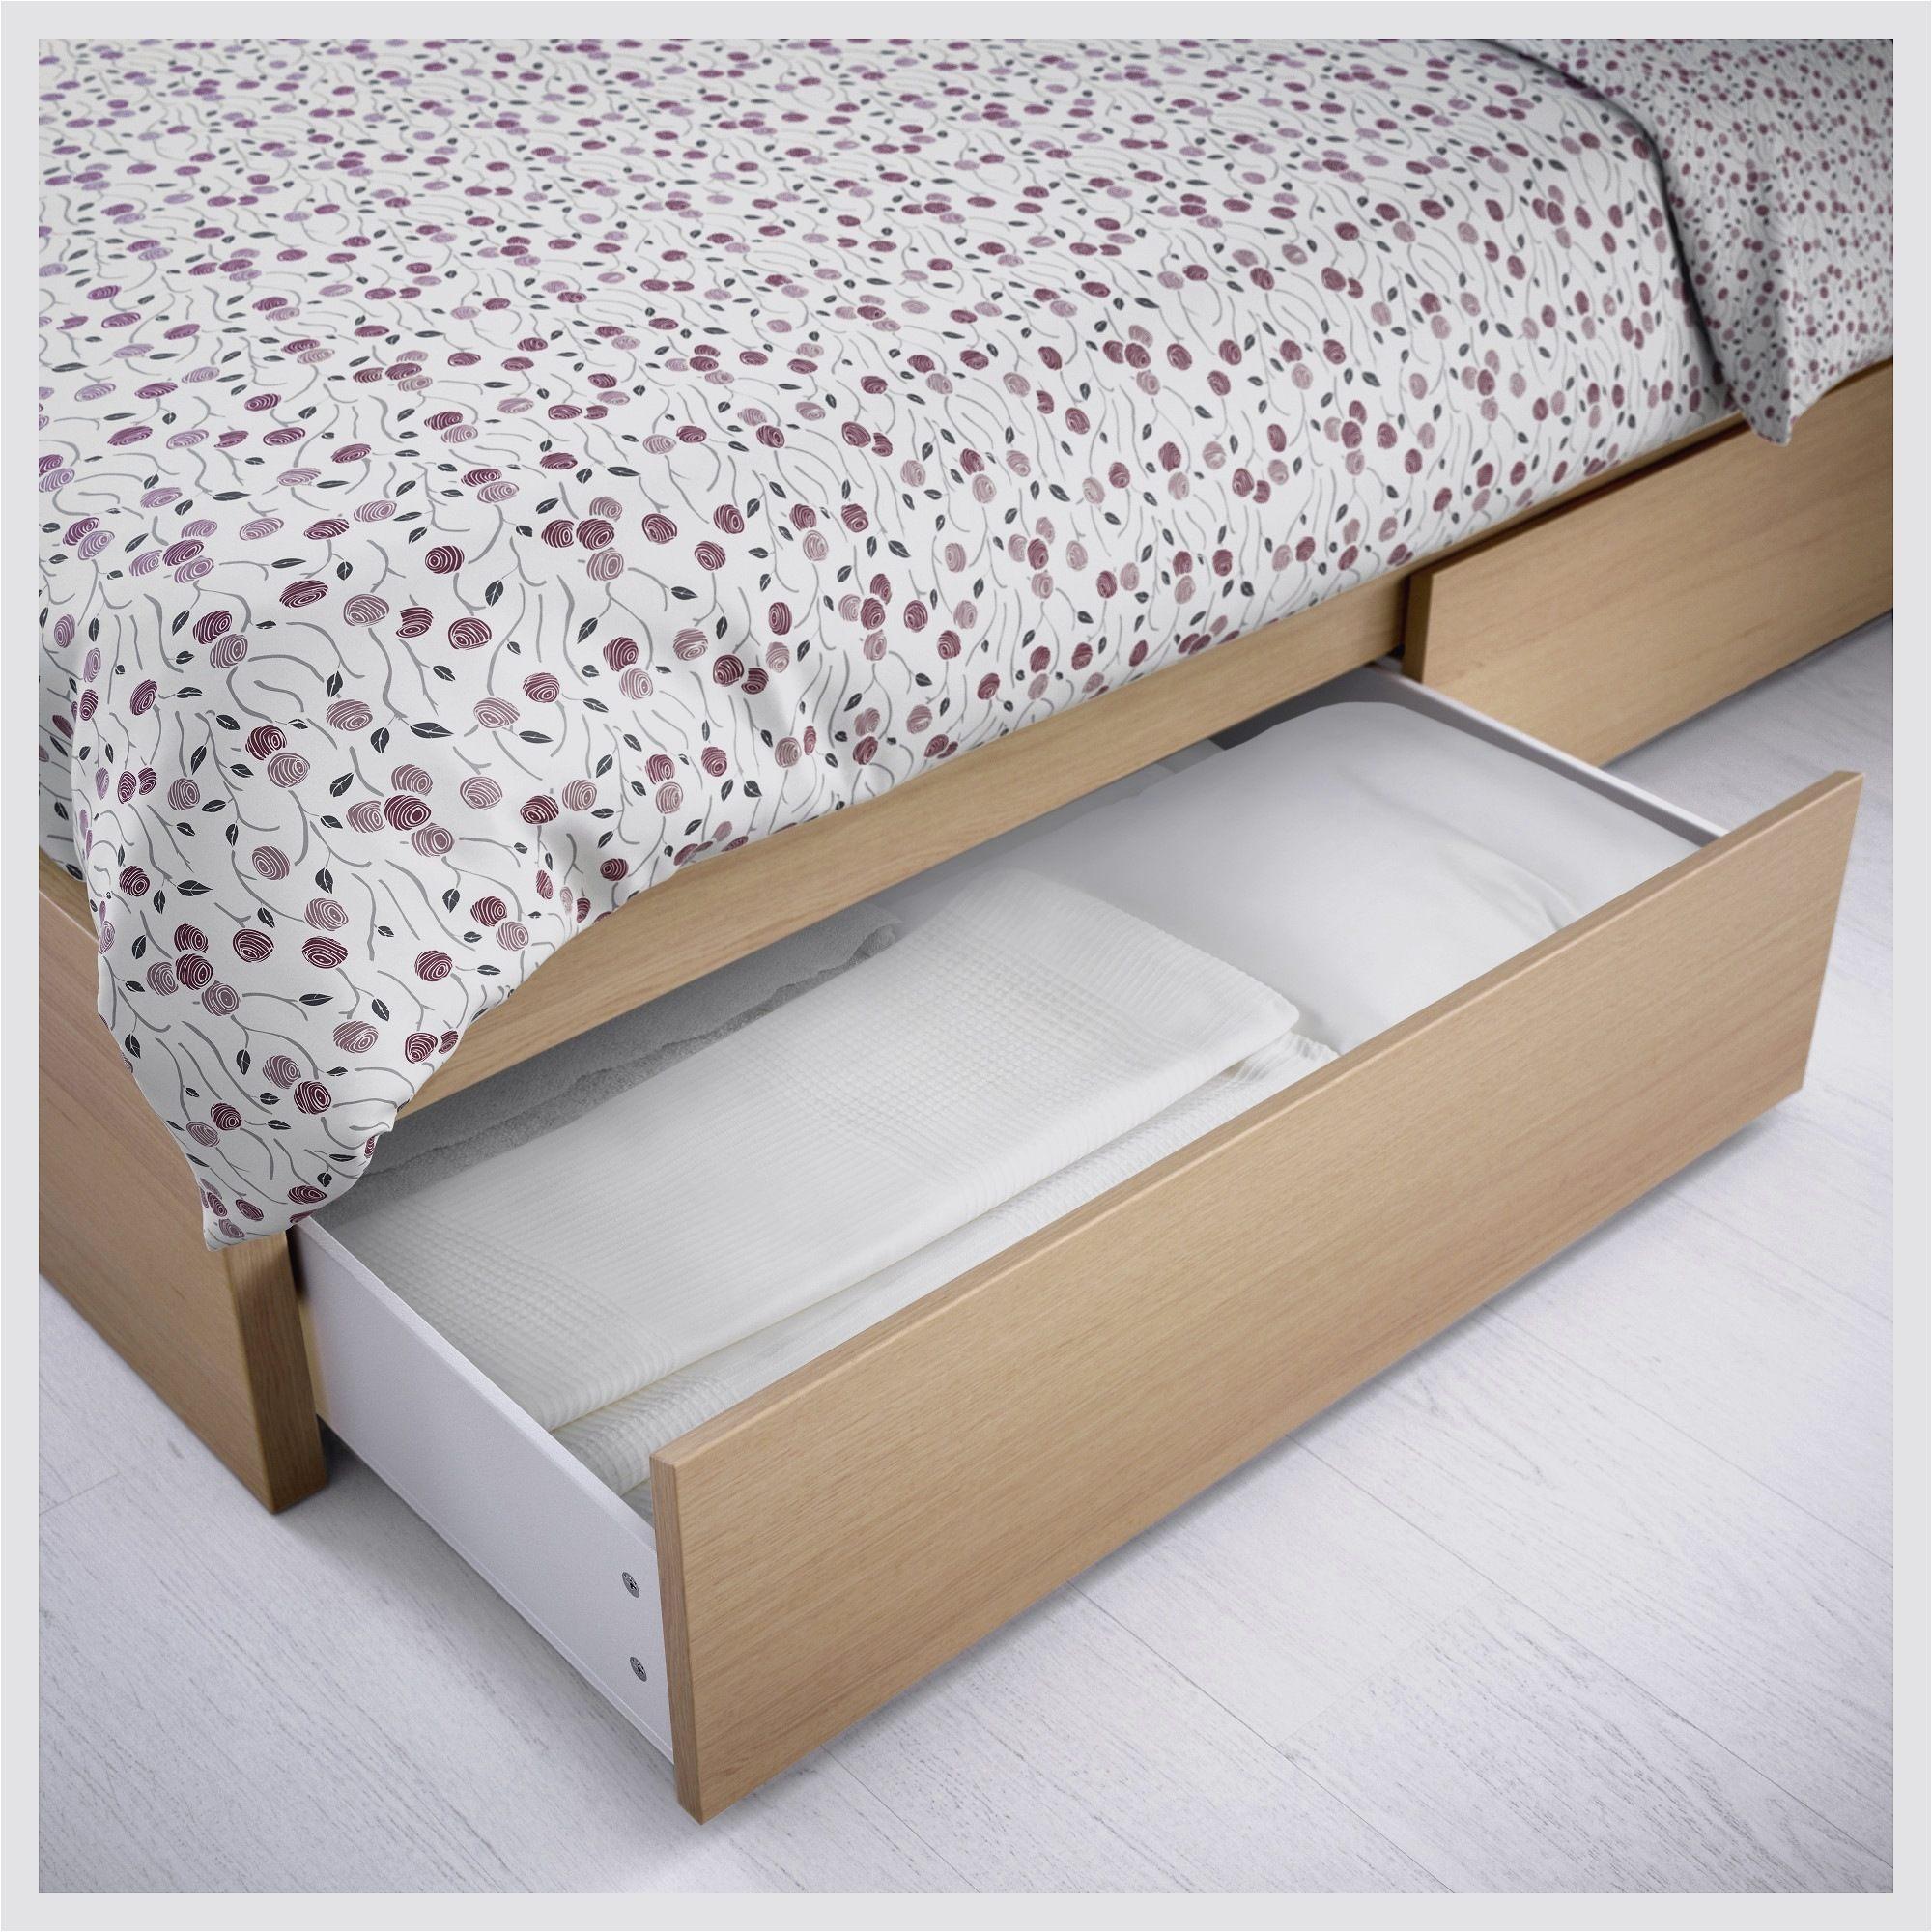 Lit Ikea Rangement Luxe Rangement Dessous De Lit Best Lit Avec Escalier Rangement Rangement